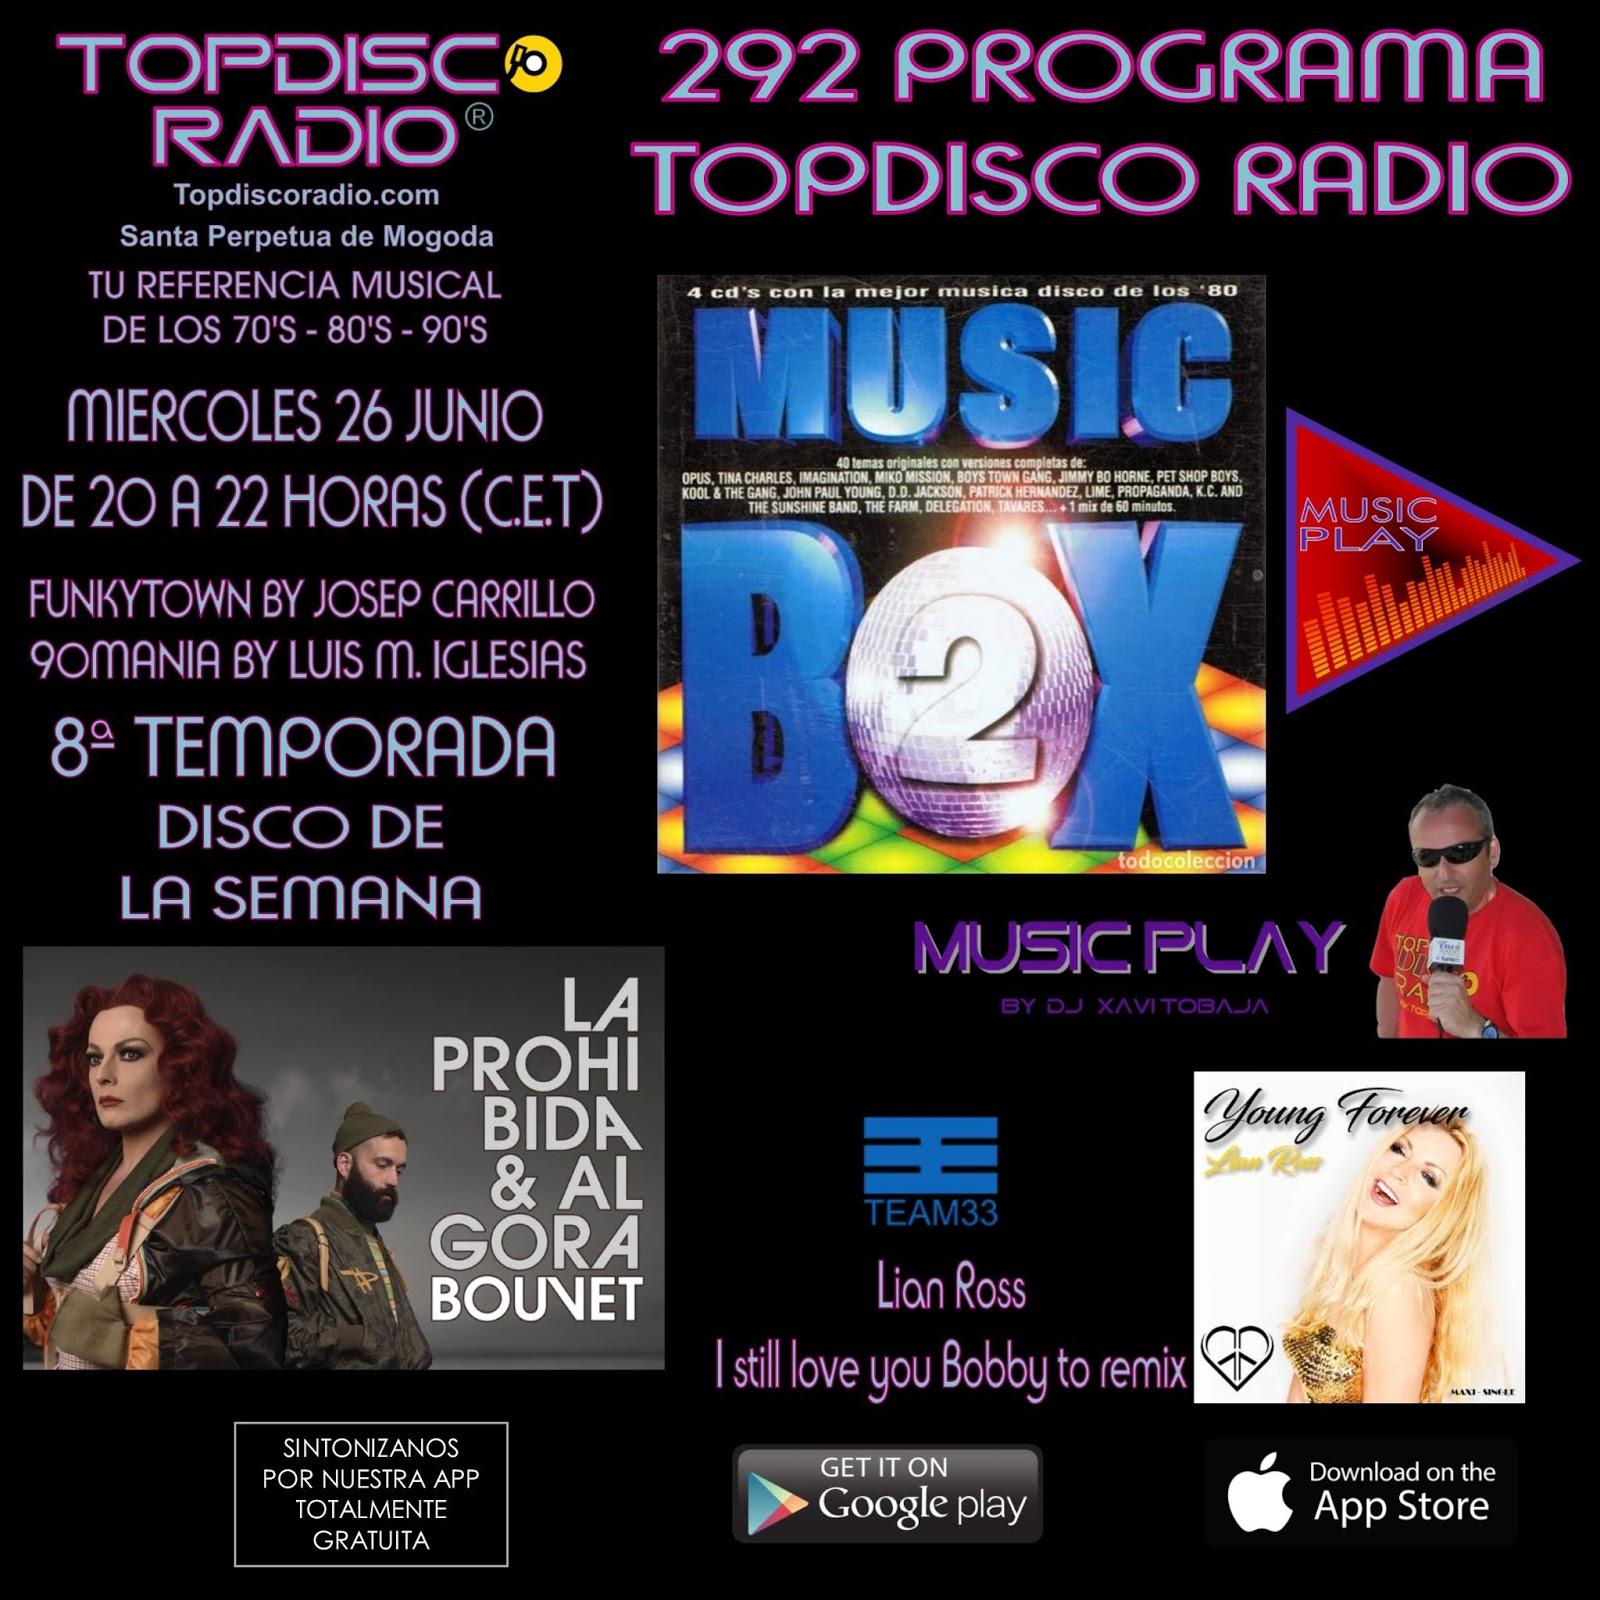 292 Programa Topdisco Radio